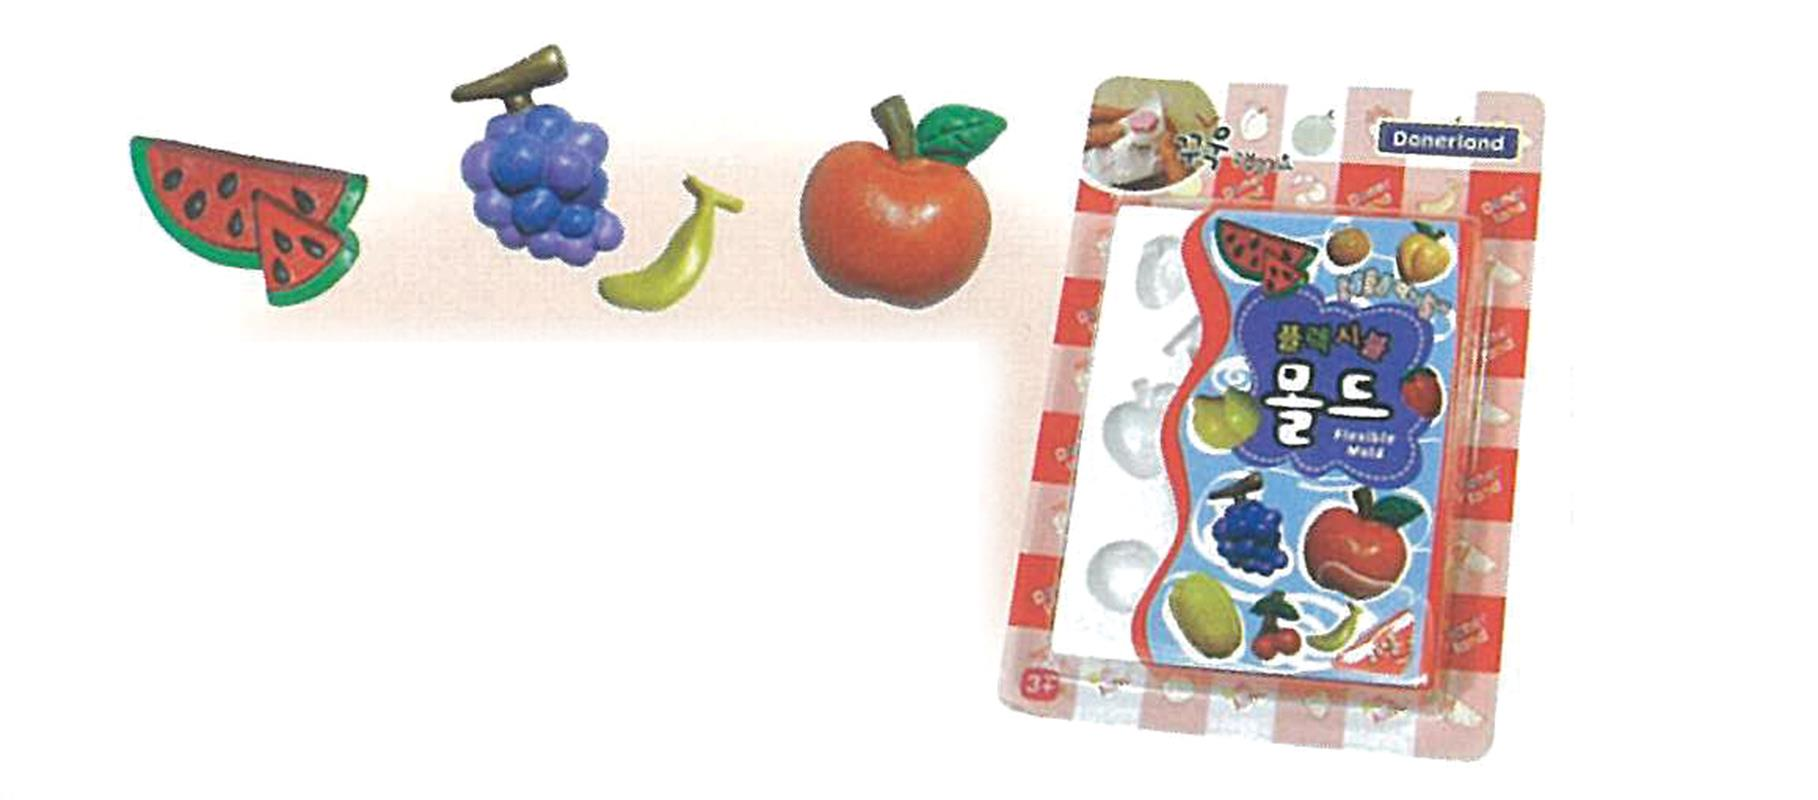 Donerland Φόρμα σιλικόνης Φρούτα με 10 θήκες 30.5x14.5x12.5εκ. 28312---ΔΑ-2